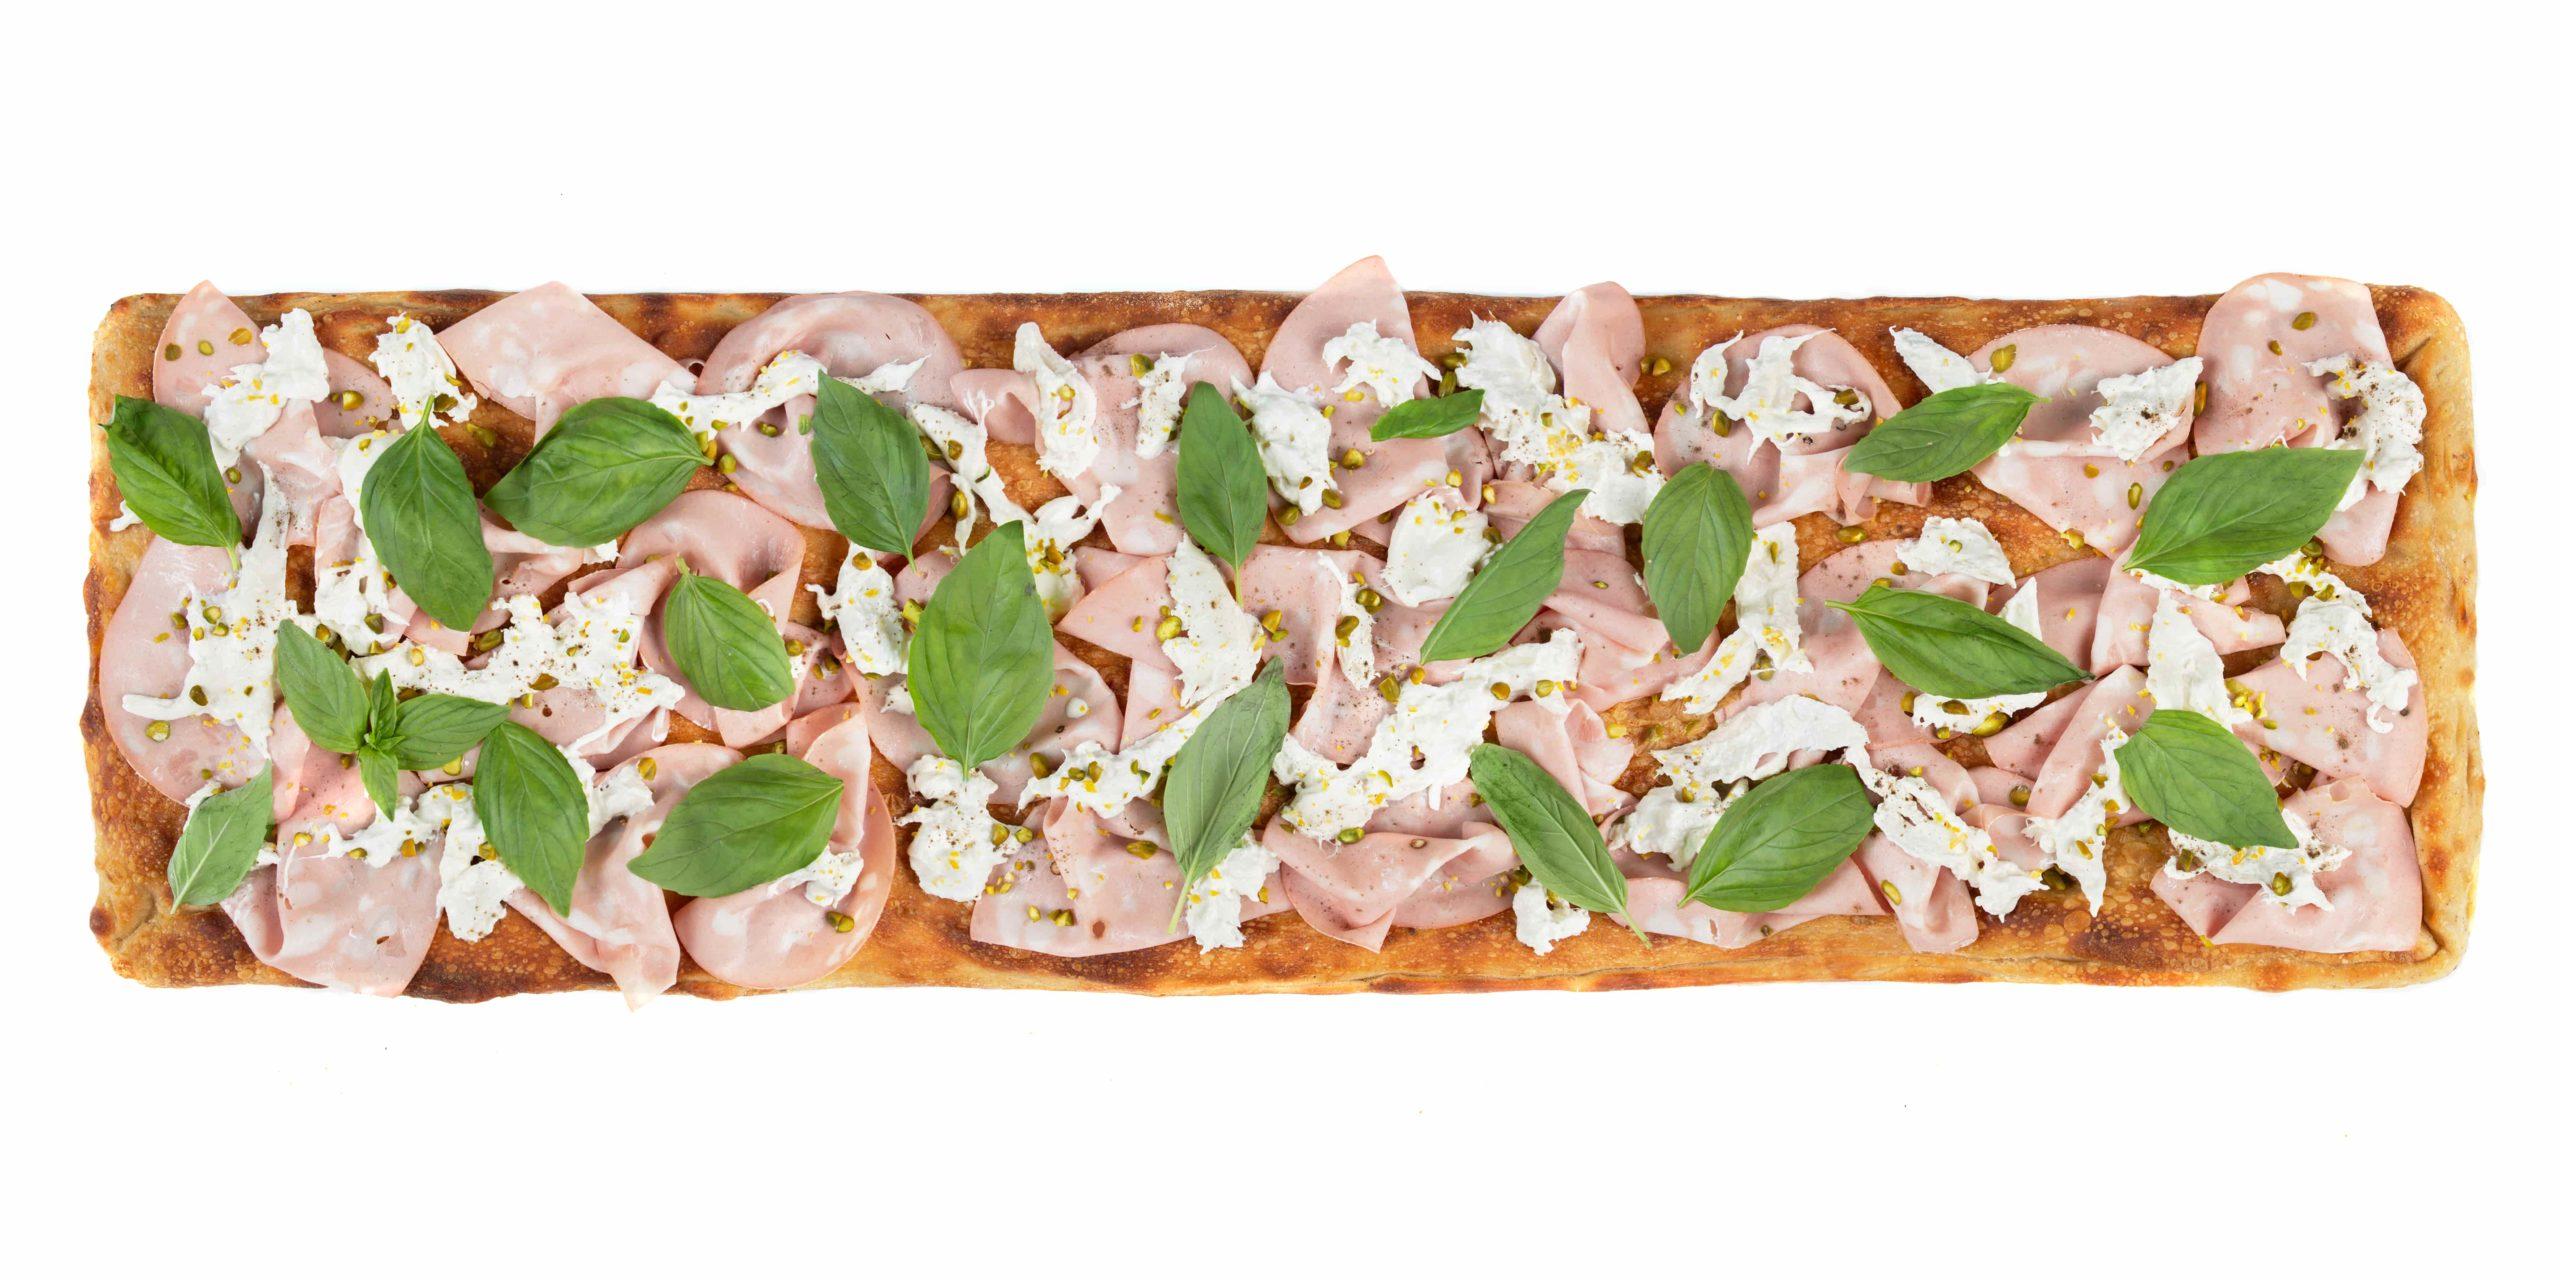 Futura Pizza Lab Friedrichshain Mortadella Bufala